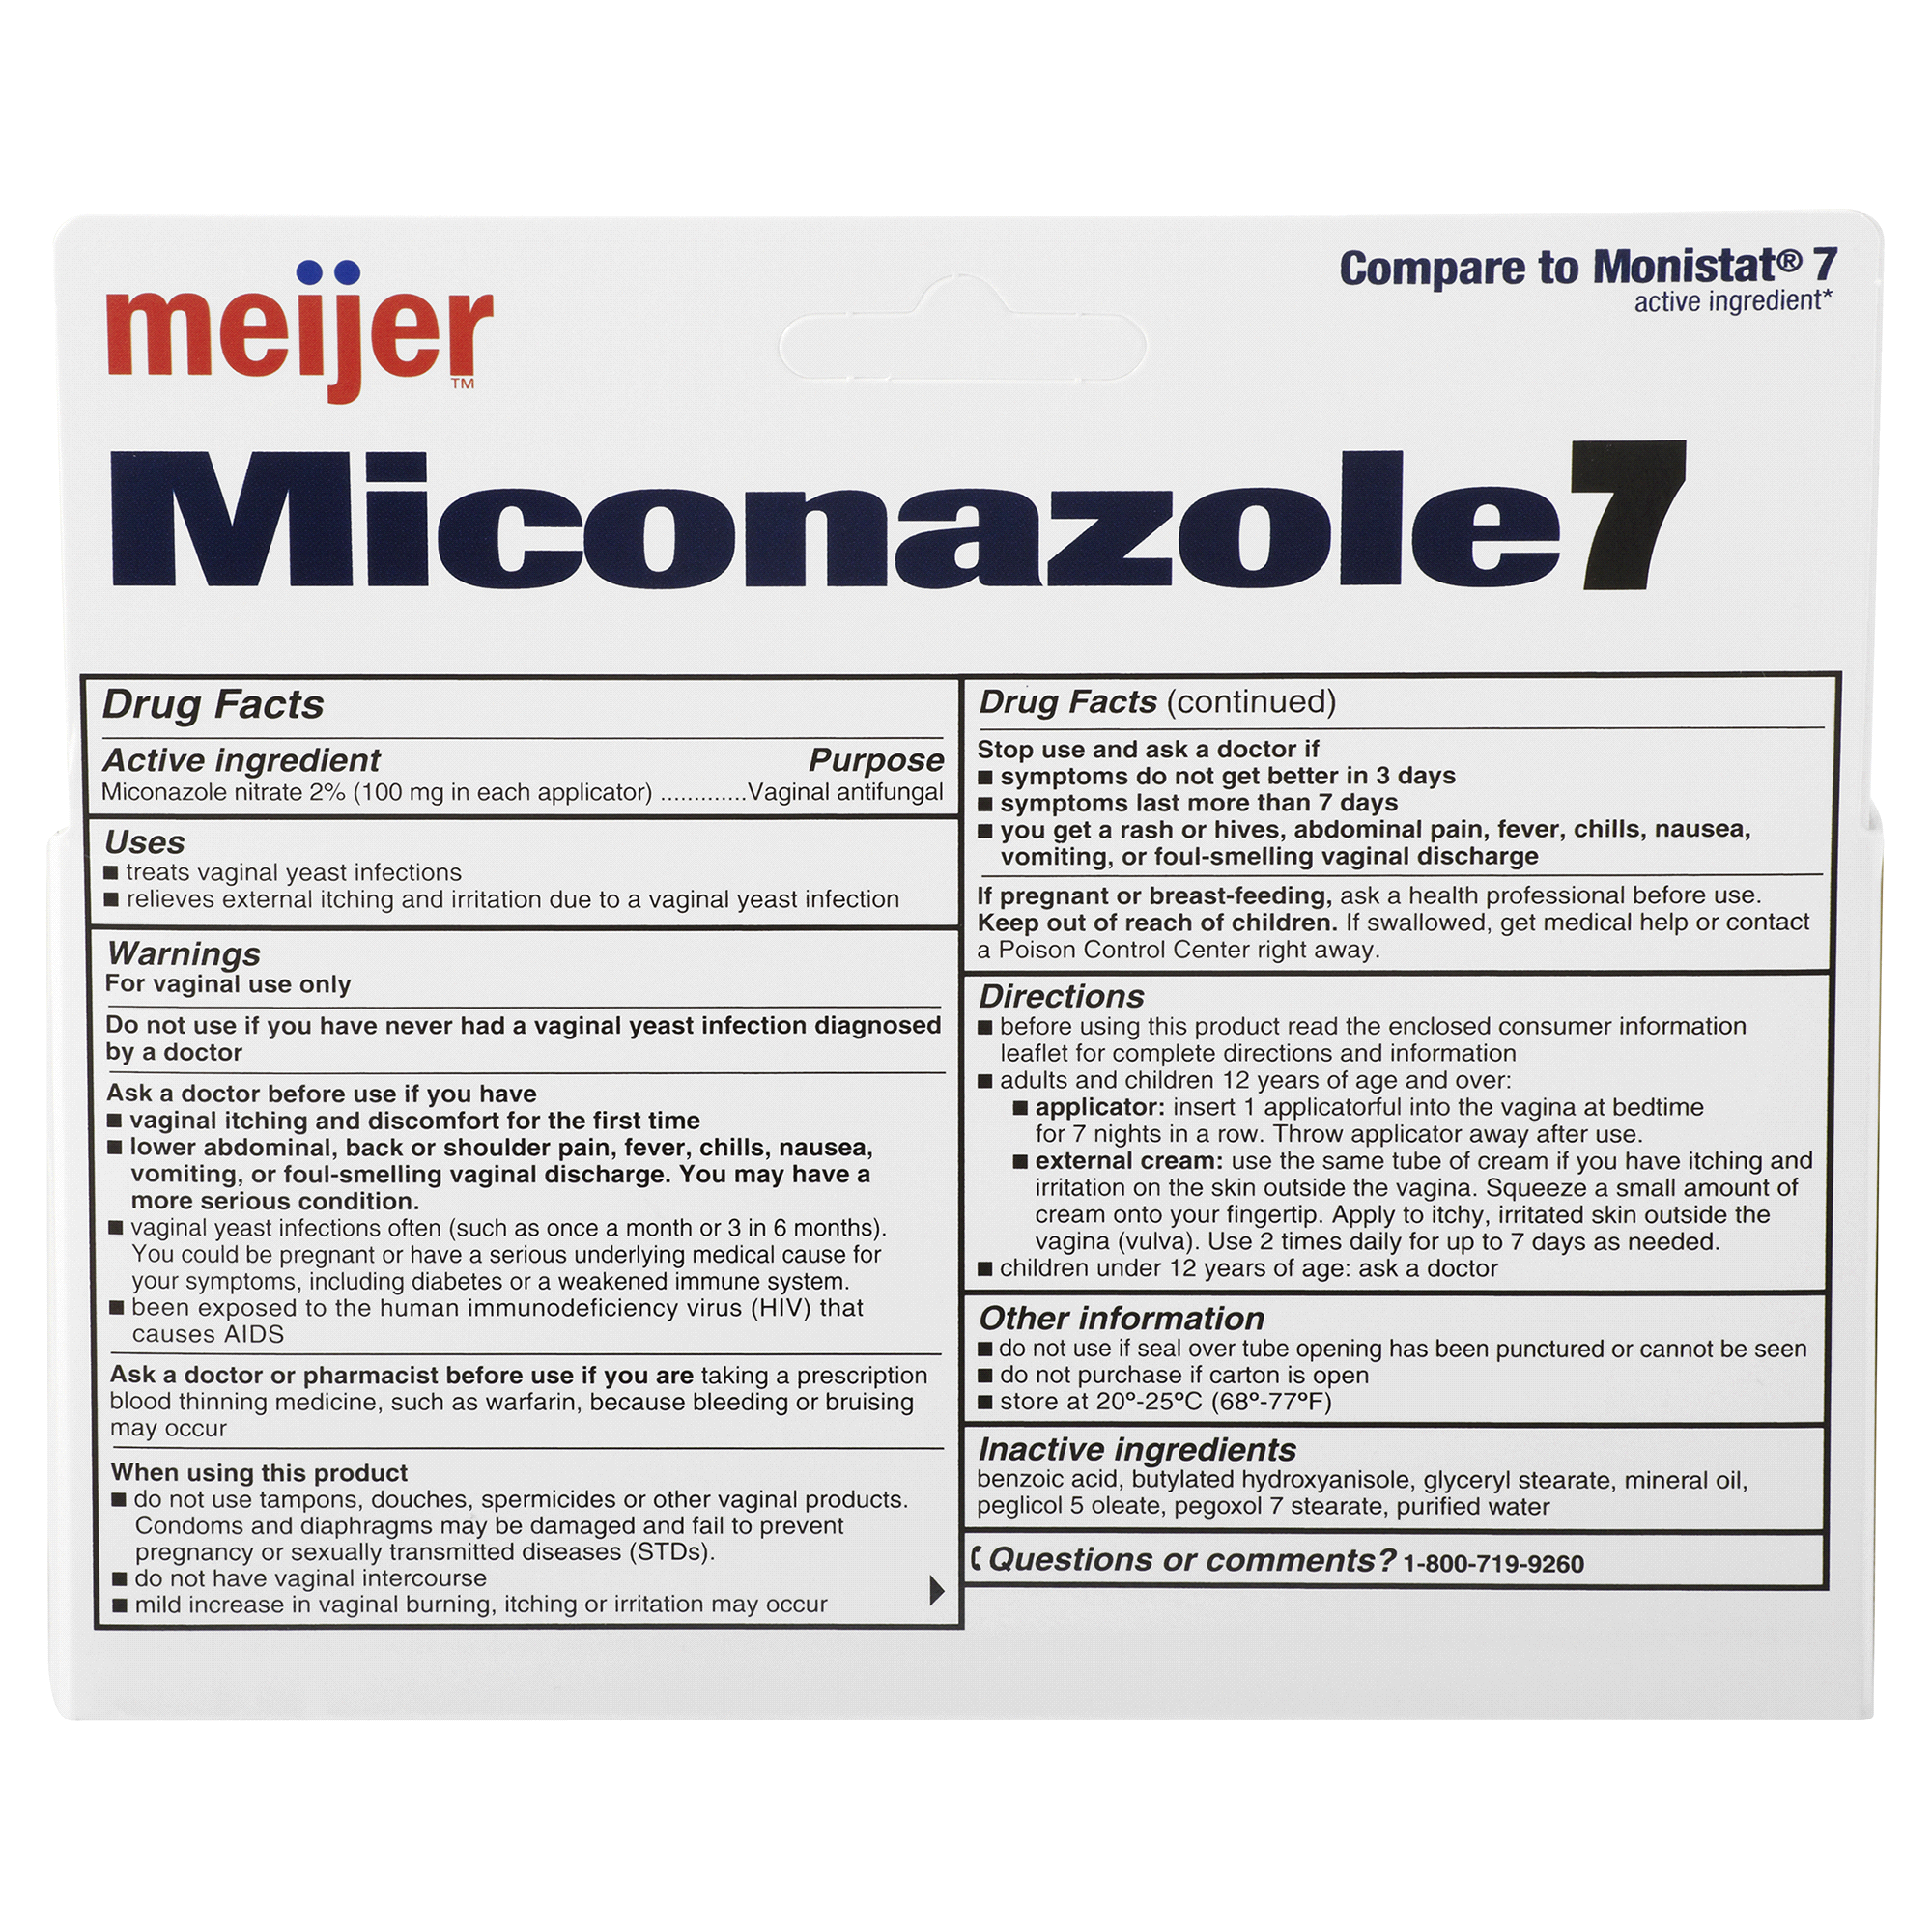 Meijer Miconazole 7 Combo Pack: Disposable Applicators   Meijer.com